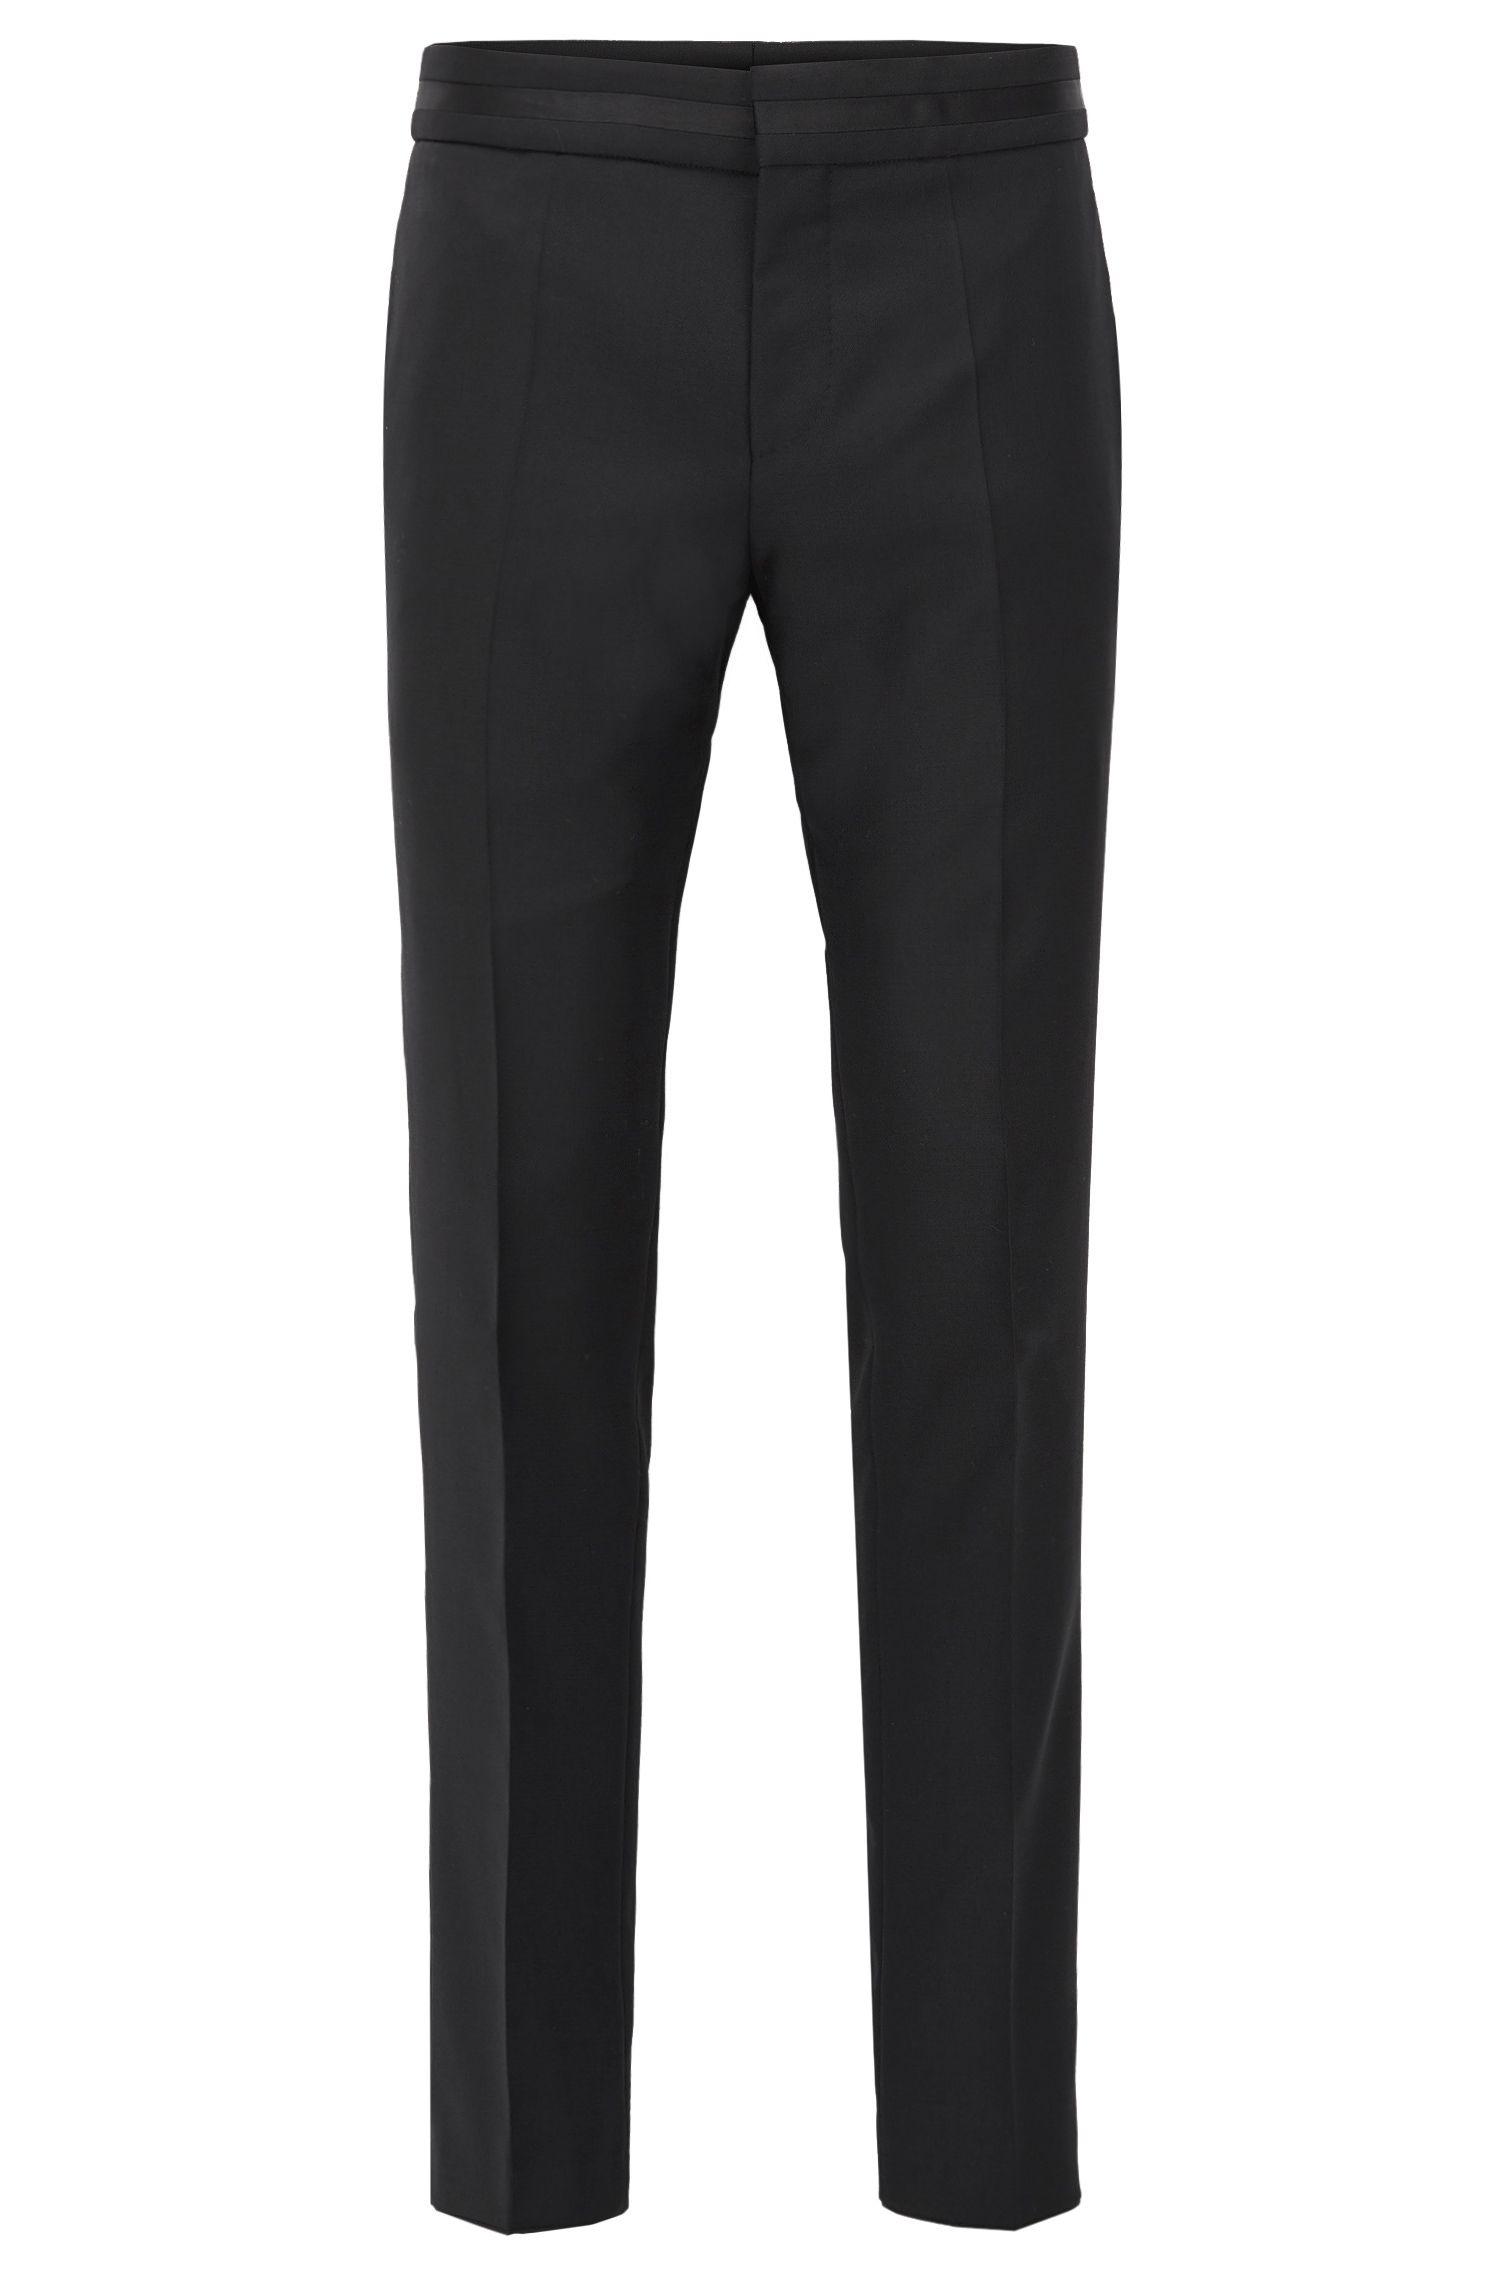 Pantalones formales slim fit en lana virgen